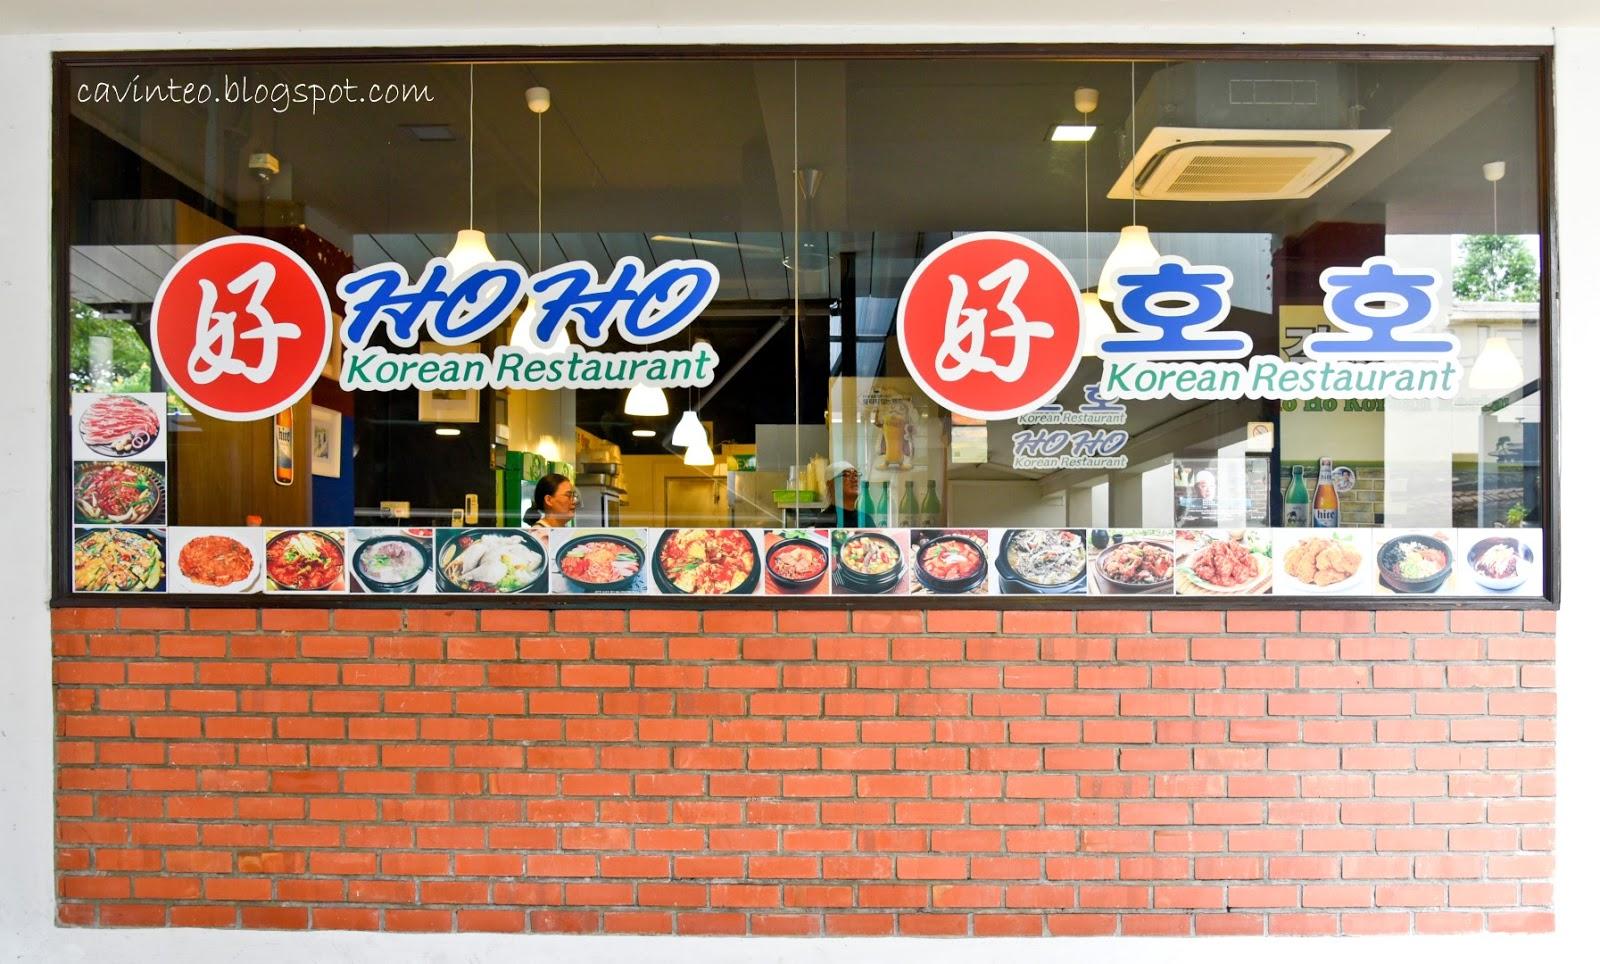 Entree Kibbles Hoho Korean Restaurant Quality Korean Food At